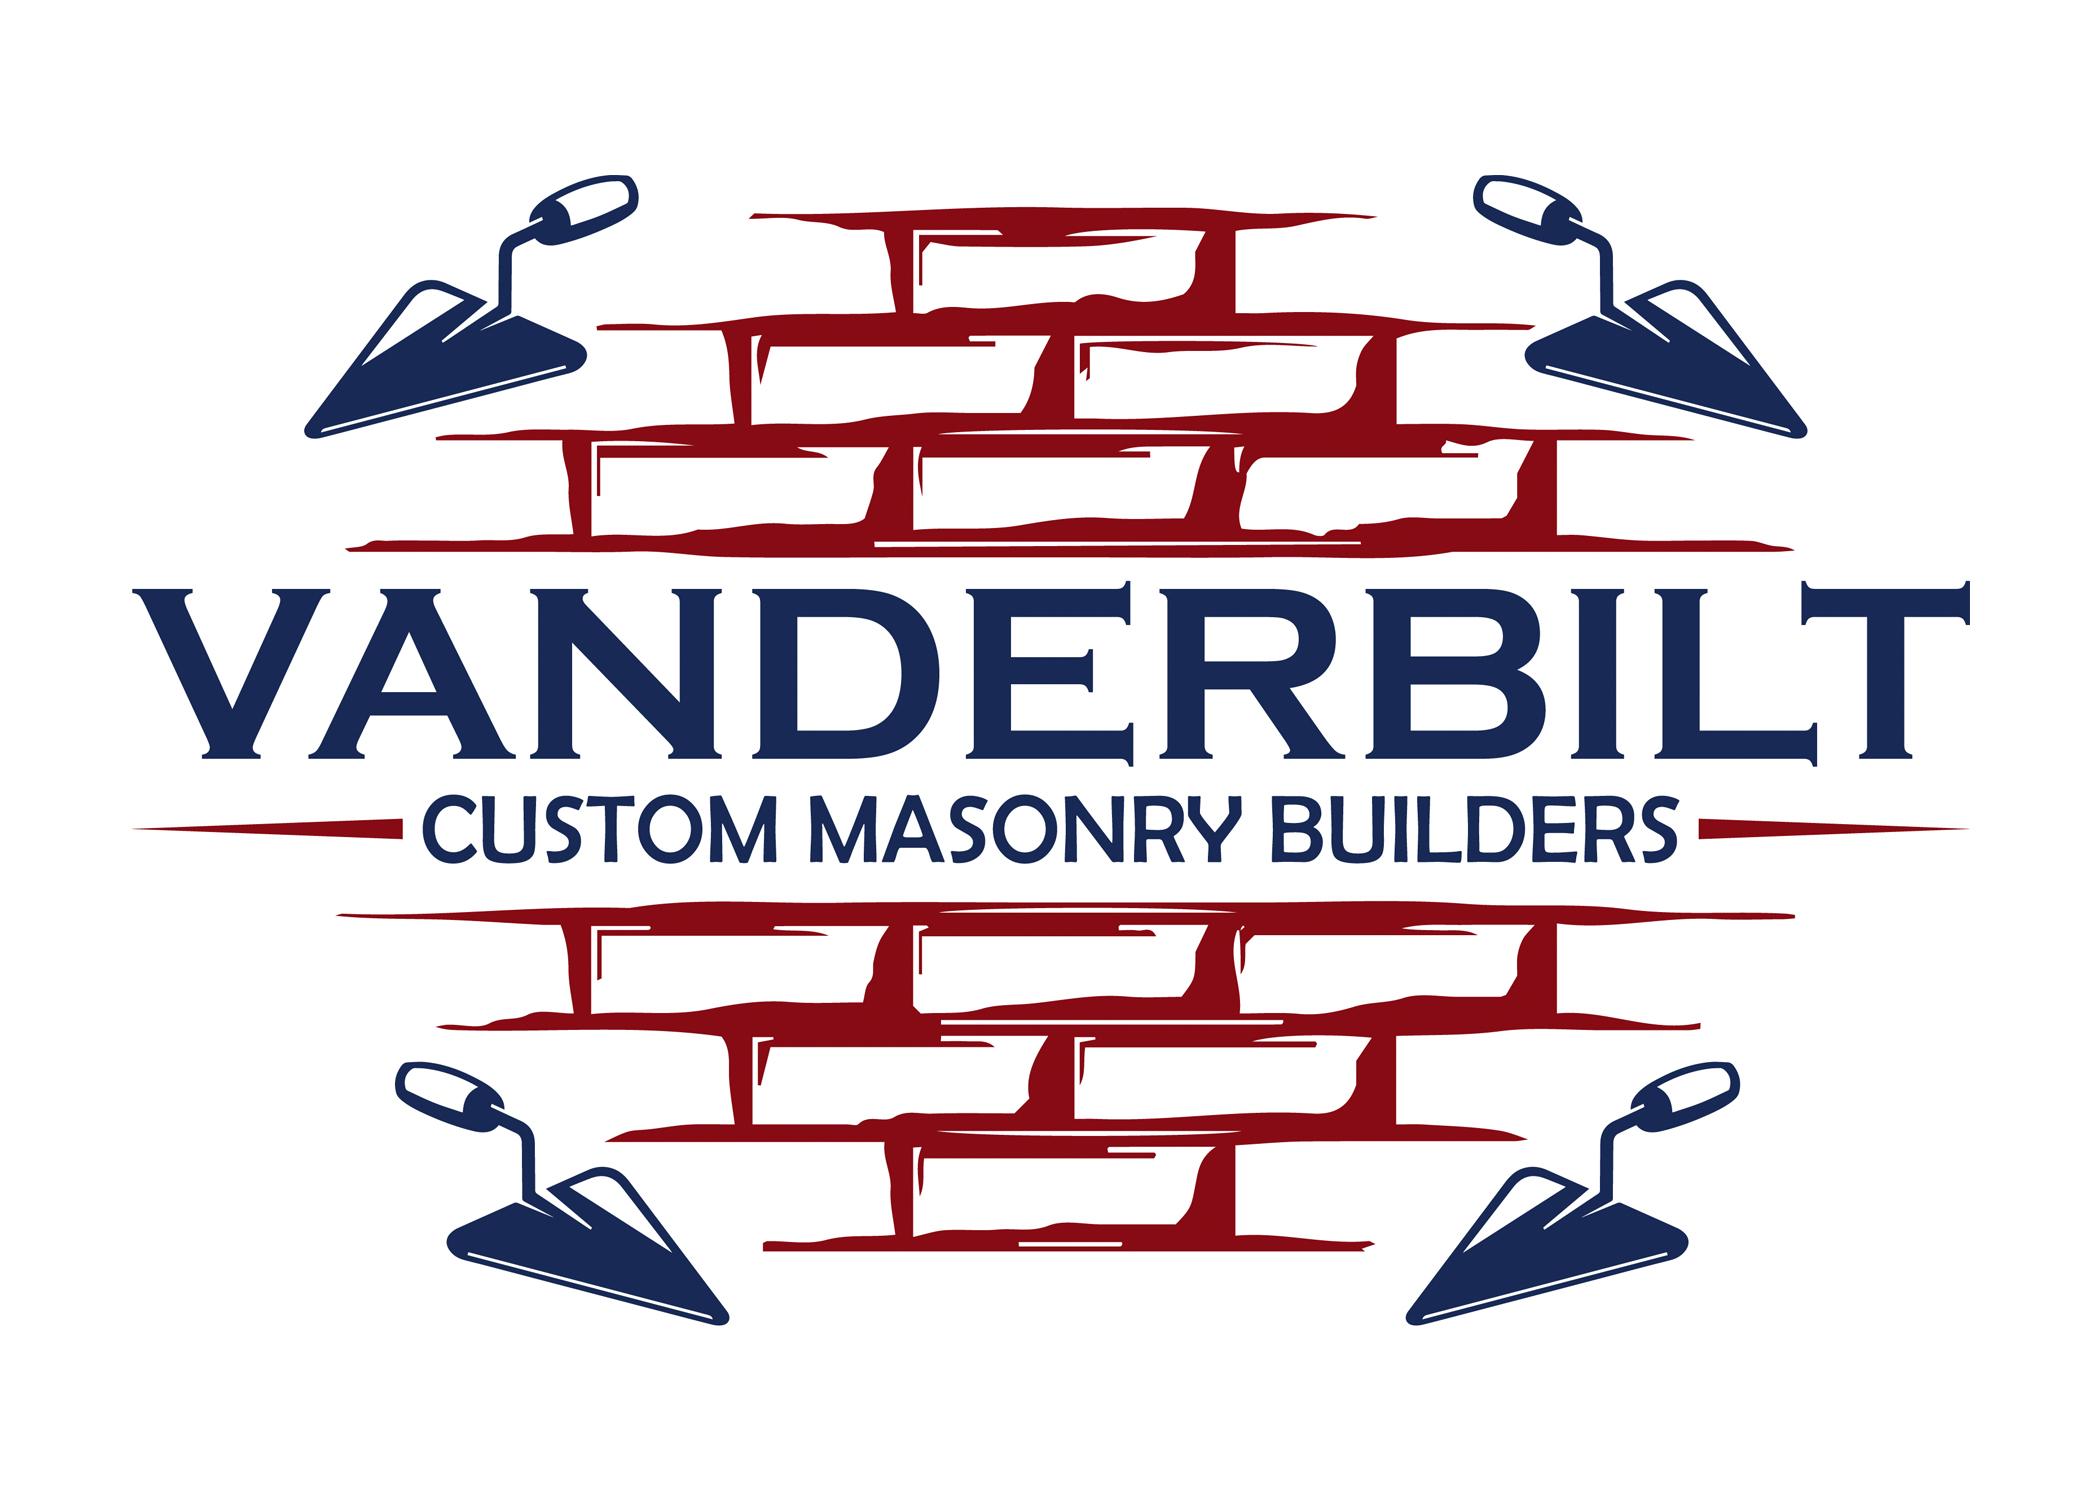 Vanderbilt Custom Masonry Builders